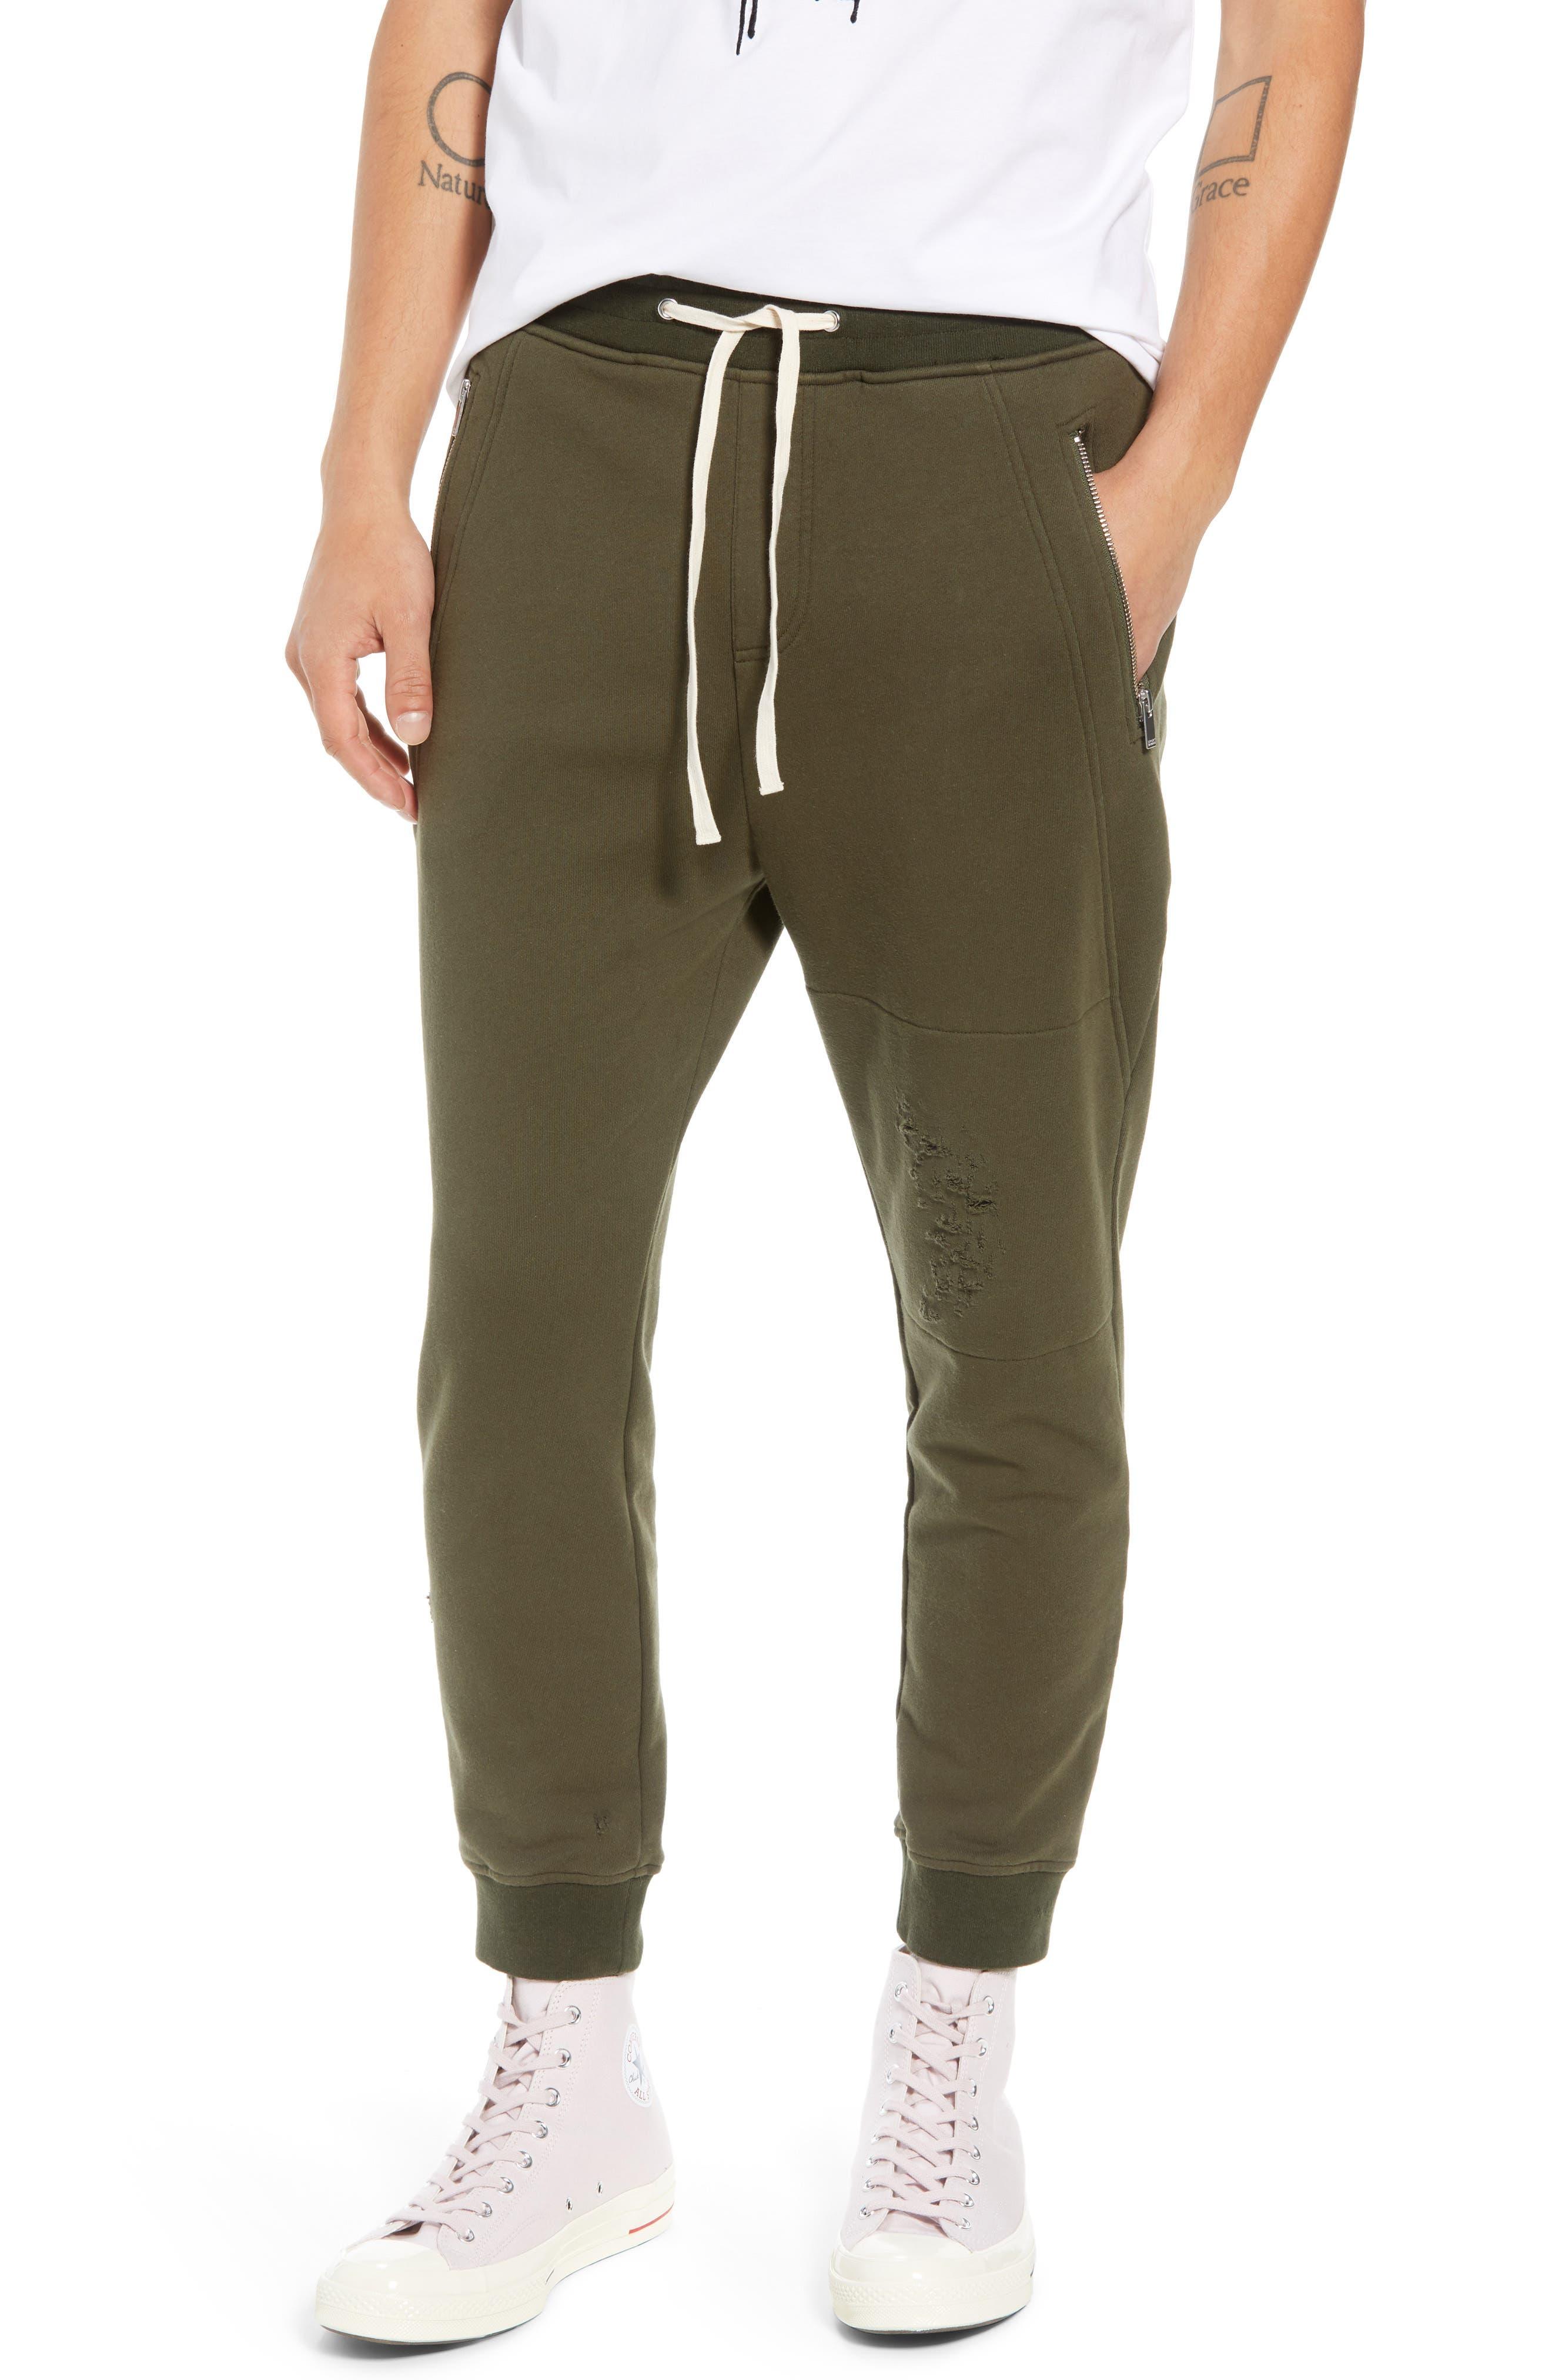 Regular Fit Sweatpants,                             Main thumbnail 1, color,                             KHAKI